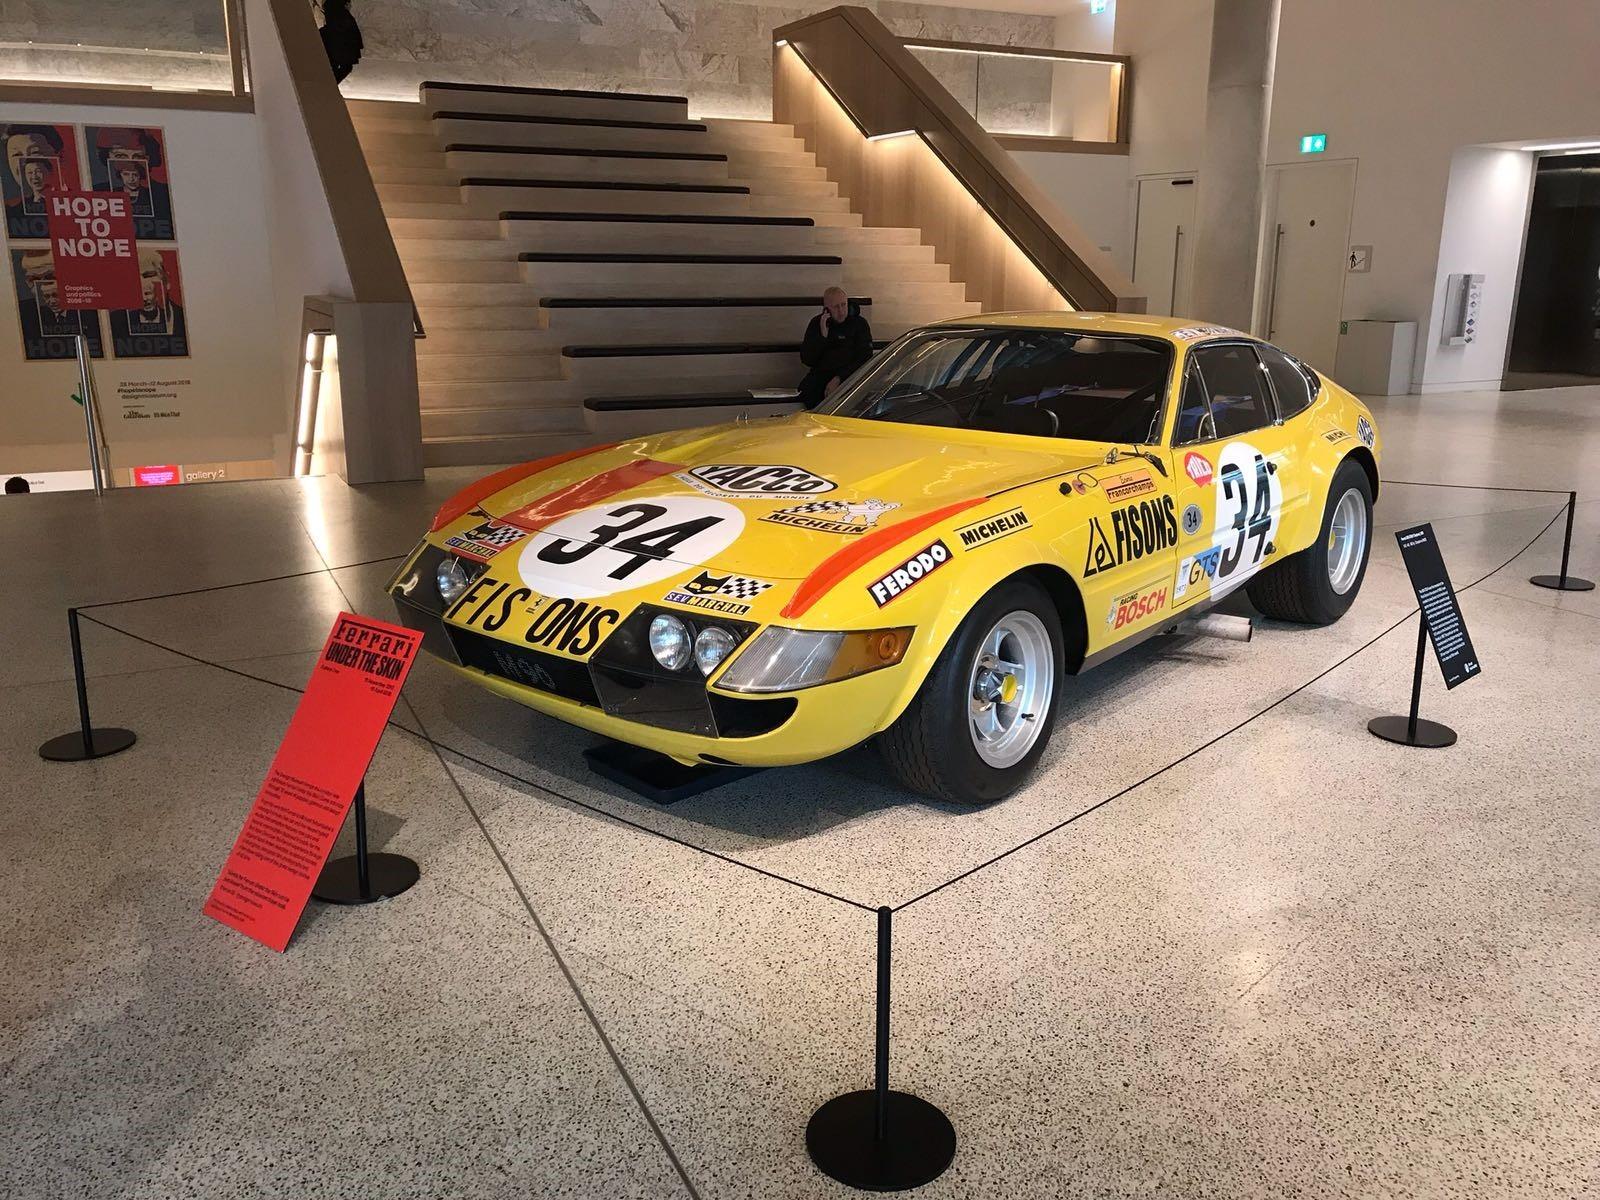 Ferrari-exhib-Daytona.jpg#asset:2589